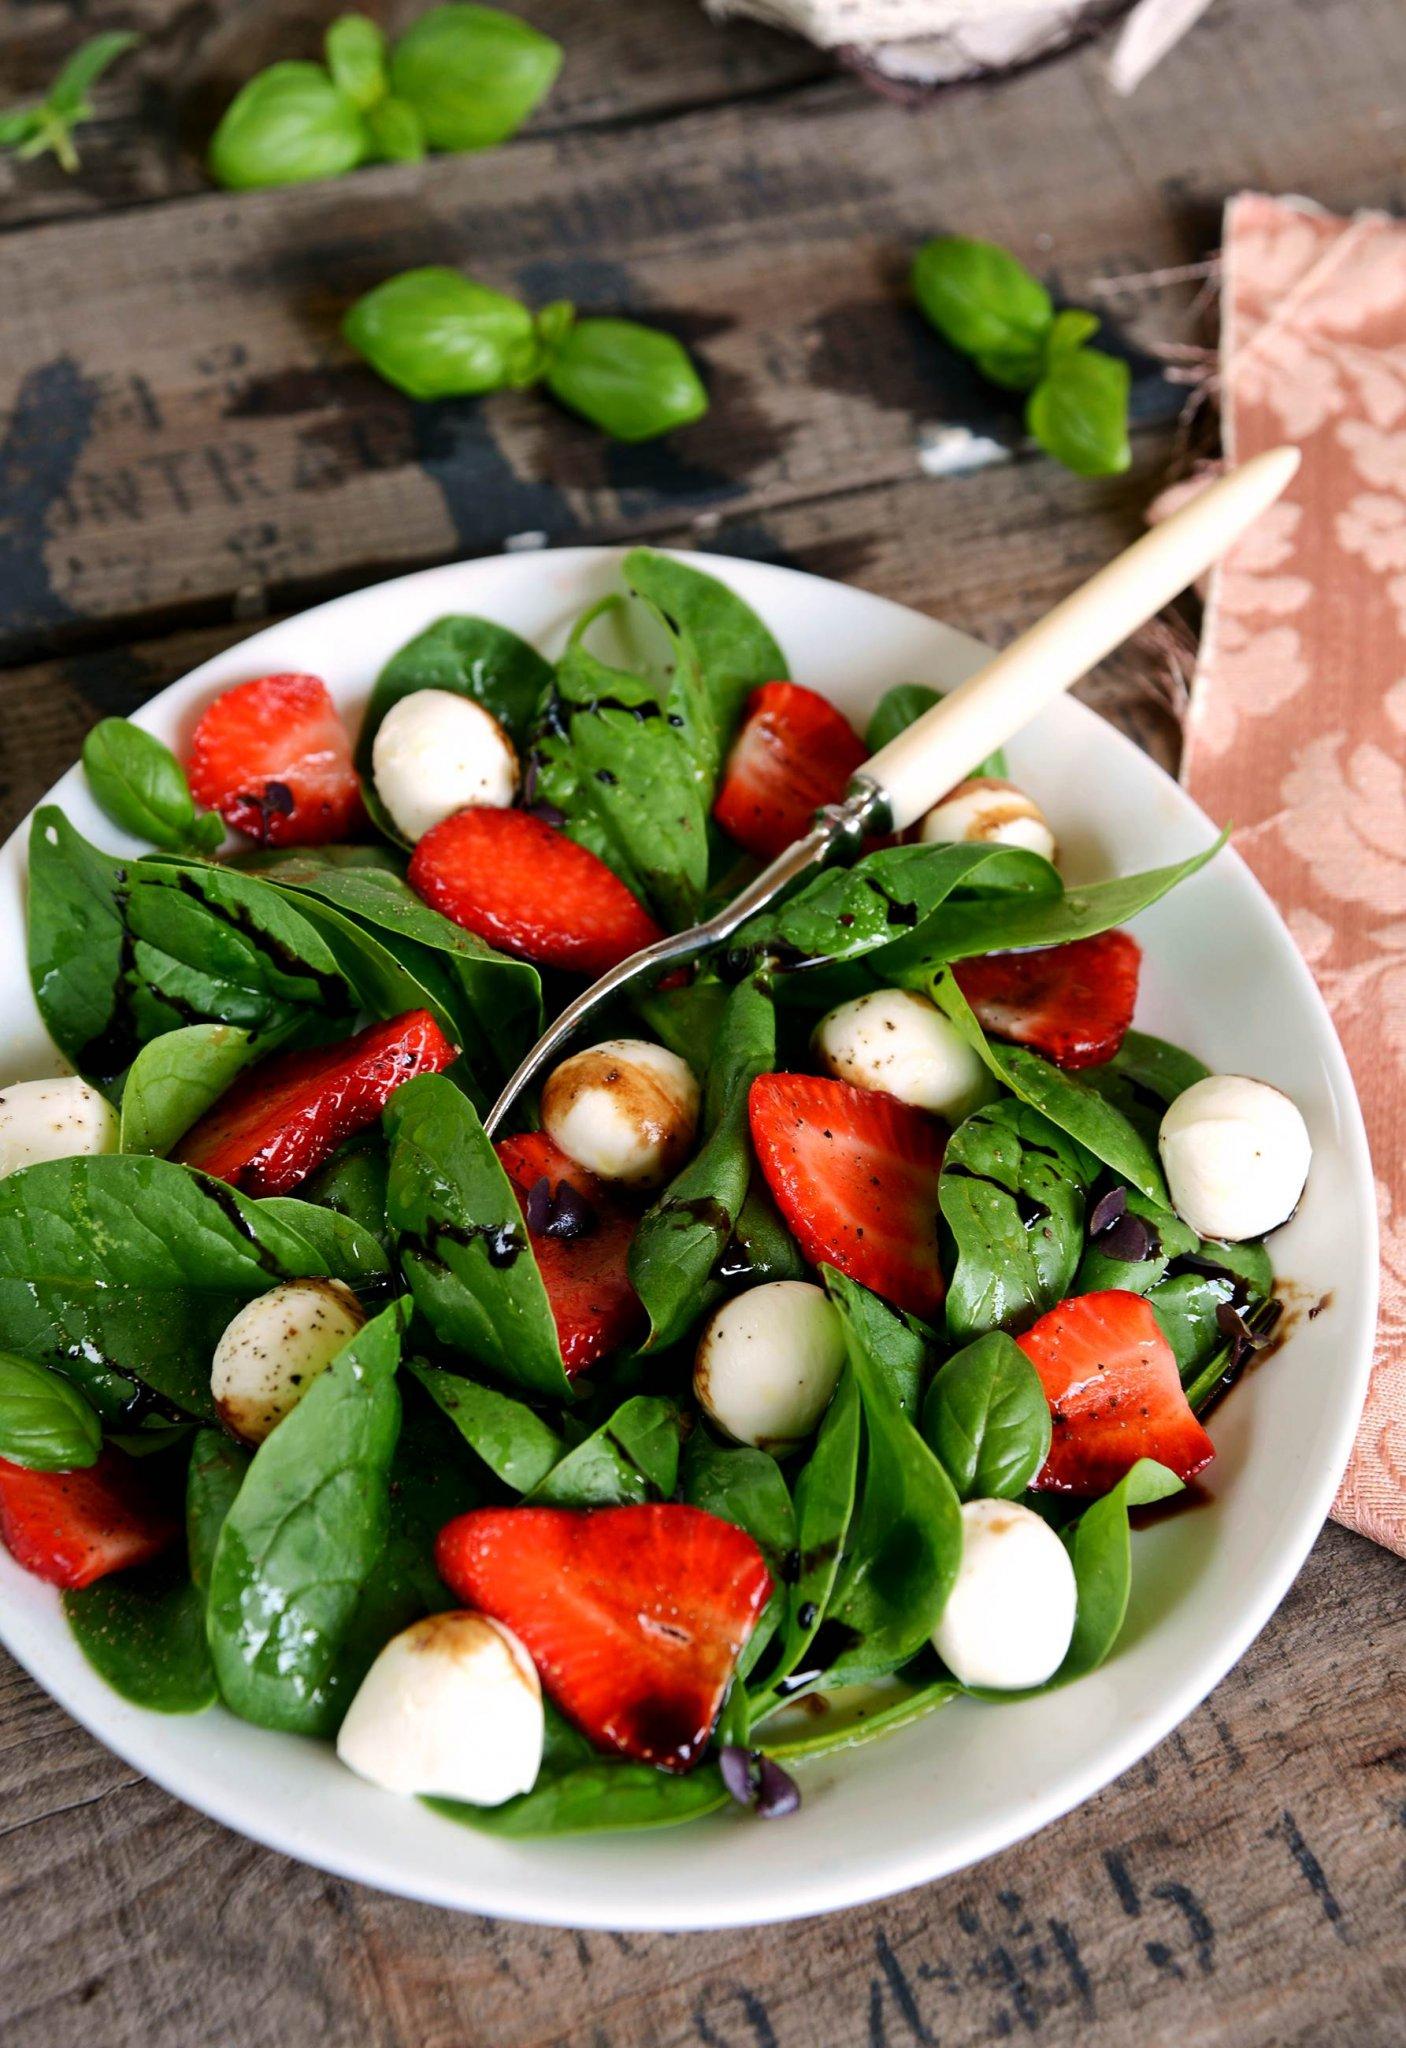 eper-spenot salata